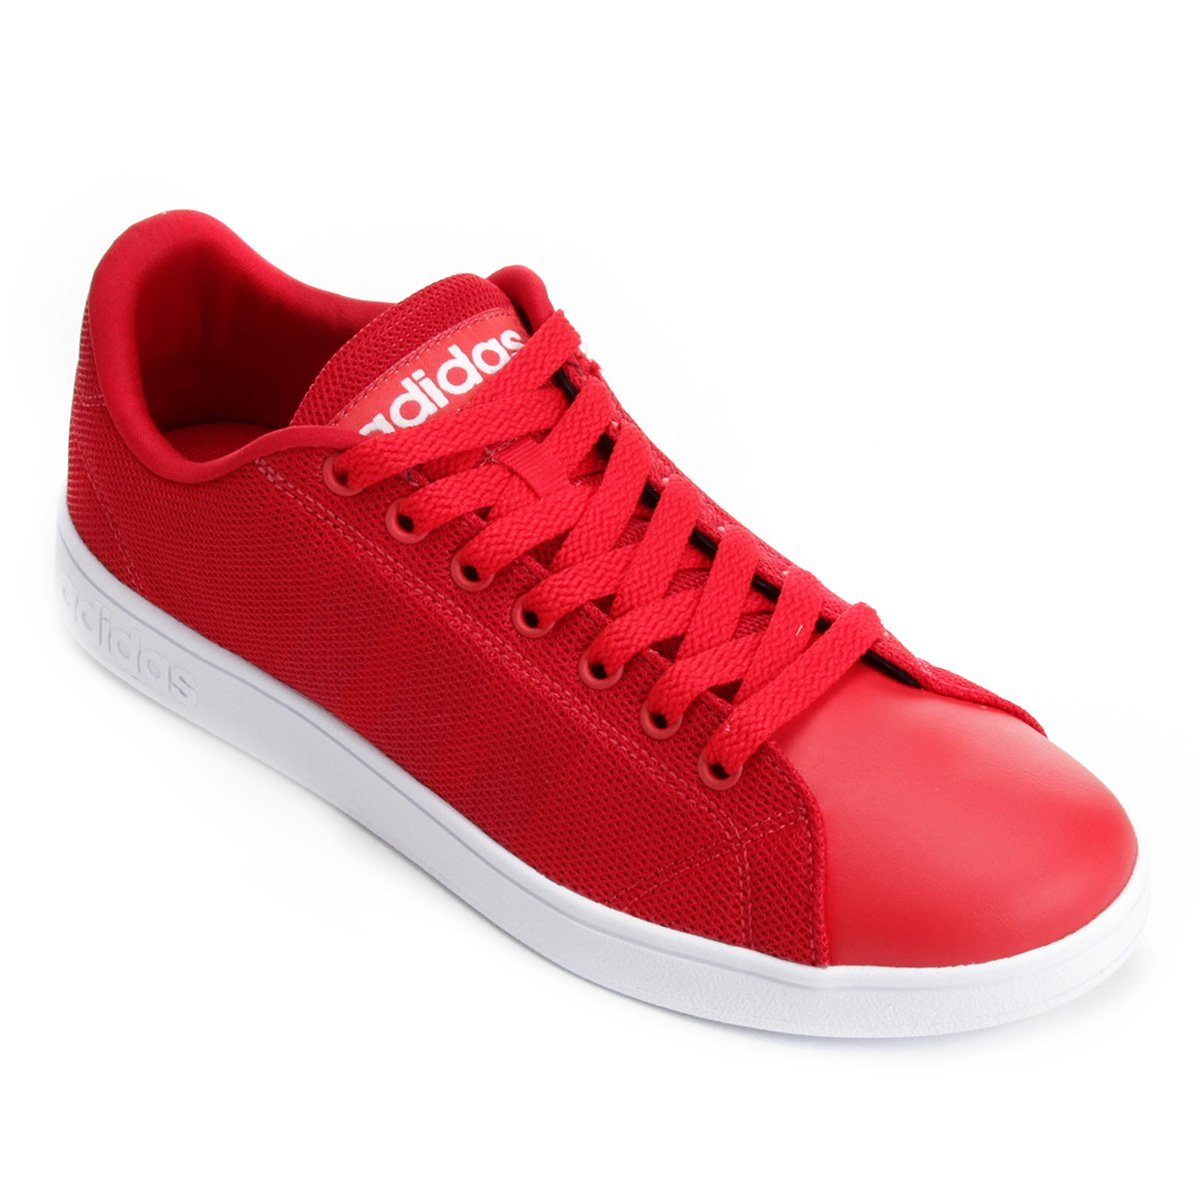 3a7fe7e7446 Tênis Adidas Vs Advantage Clean Masculino - Compre Agora